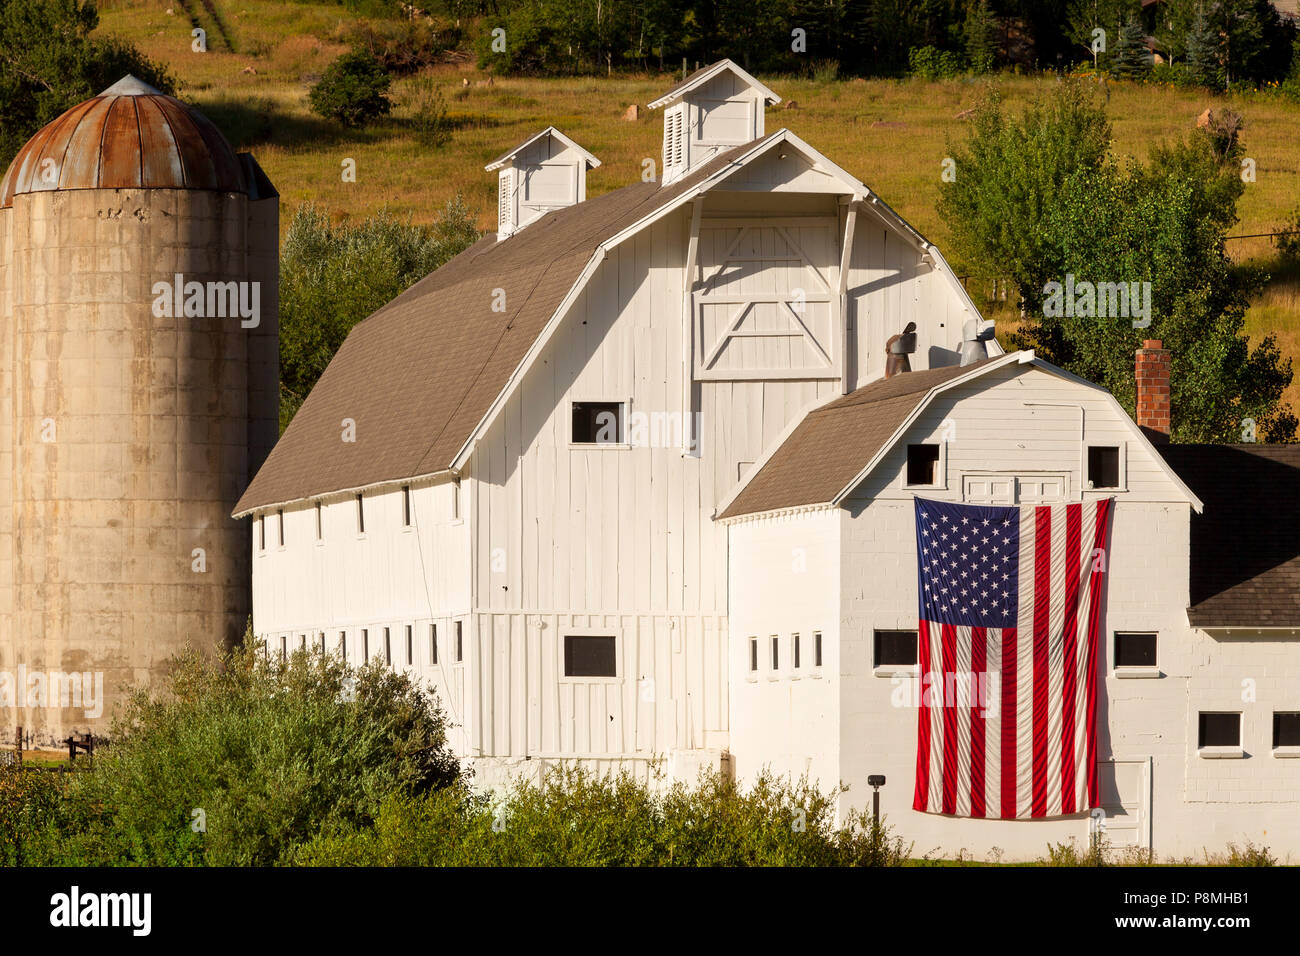 Early morning at the historic McPolin Farm aka Osguthorpe Farm in Park City, Utah, USA - Stock Image